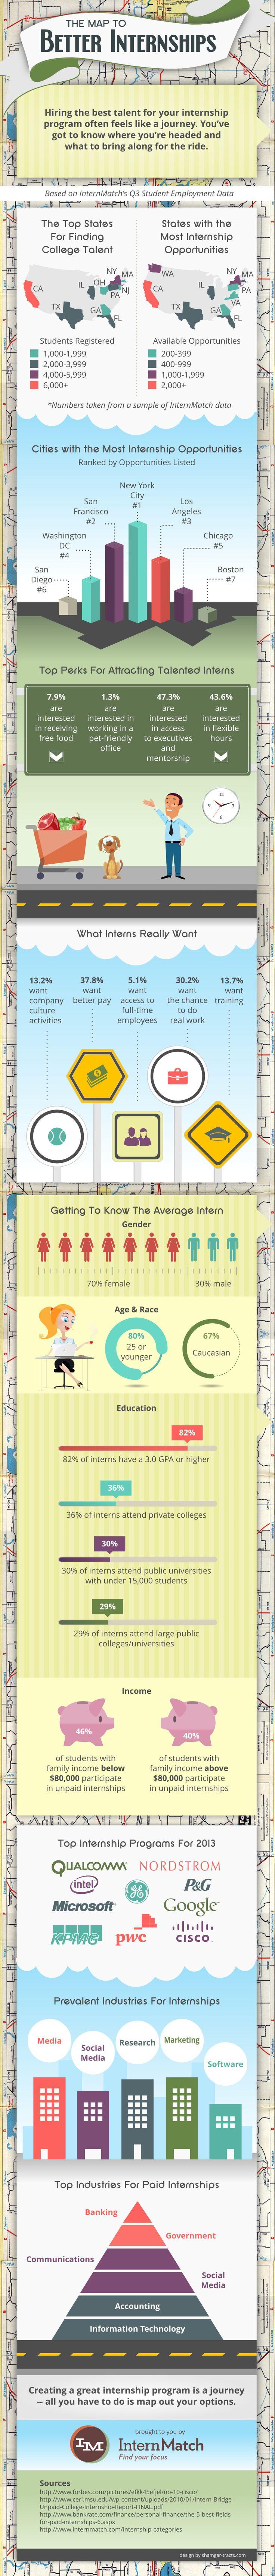 Best Internships Images On   Career Advice Job